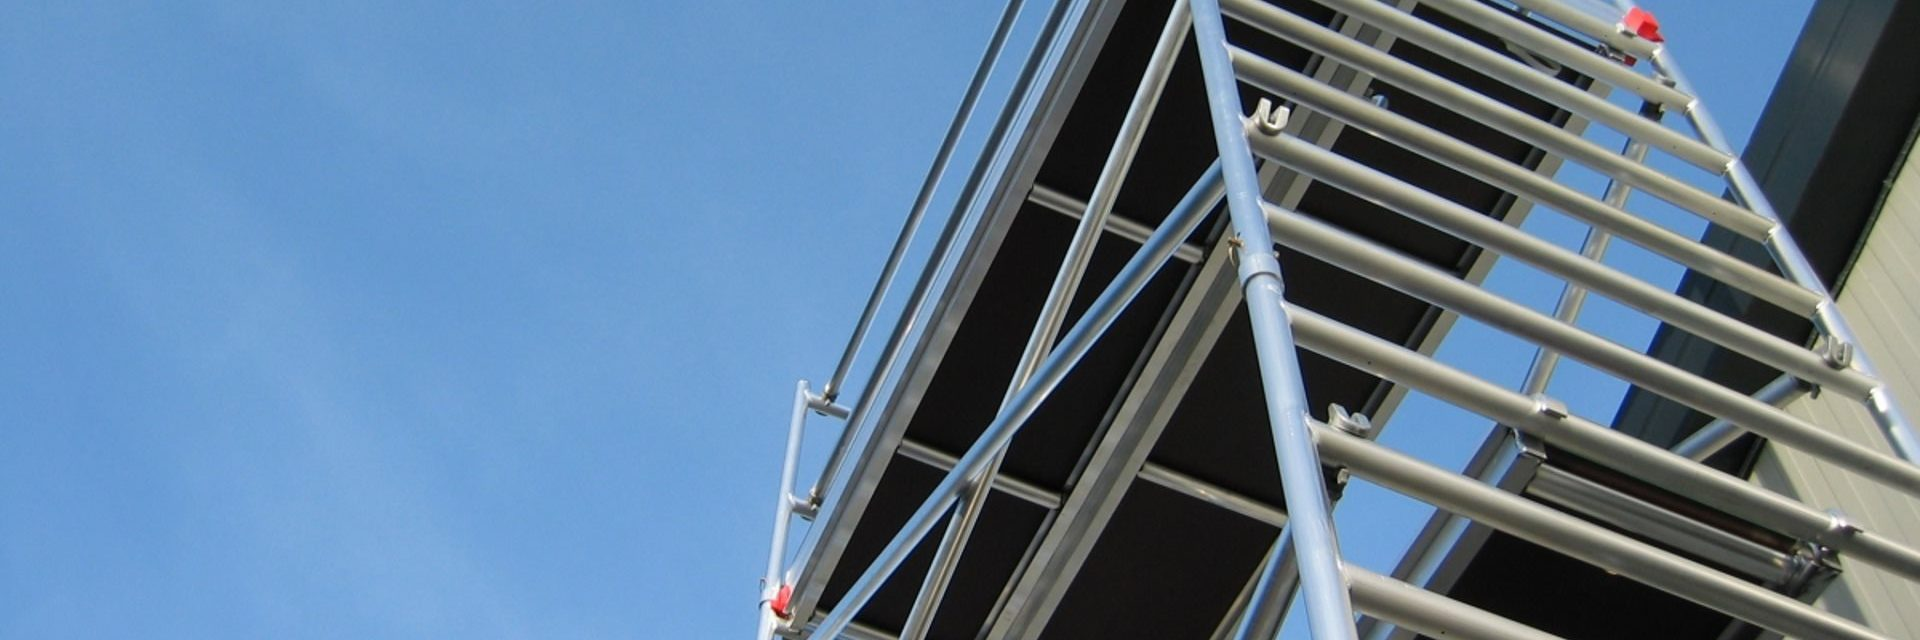 Rolling scaffolding